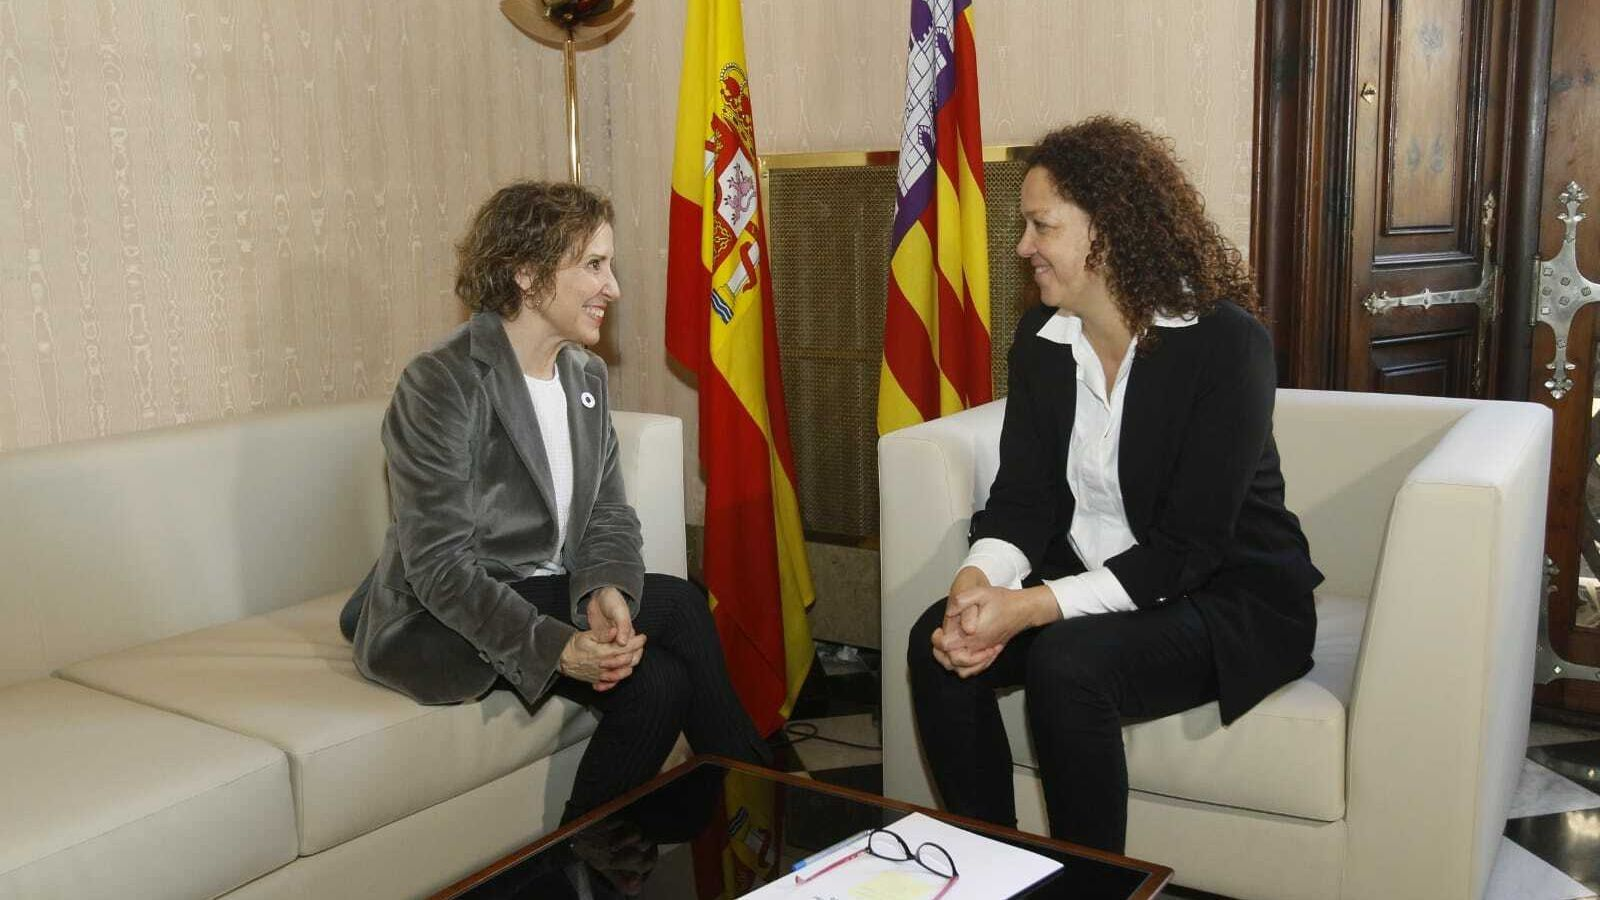 La delegada del govern a les Illes Balears, Aina Calvo, i la presidenta del Consell de Mallorca, Catalina Cladera